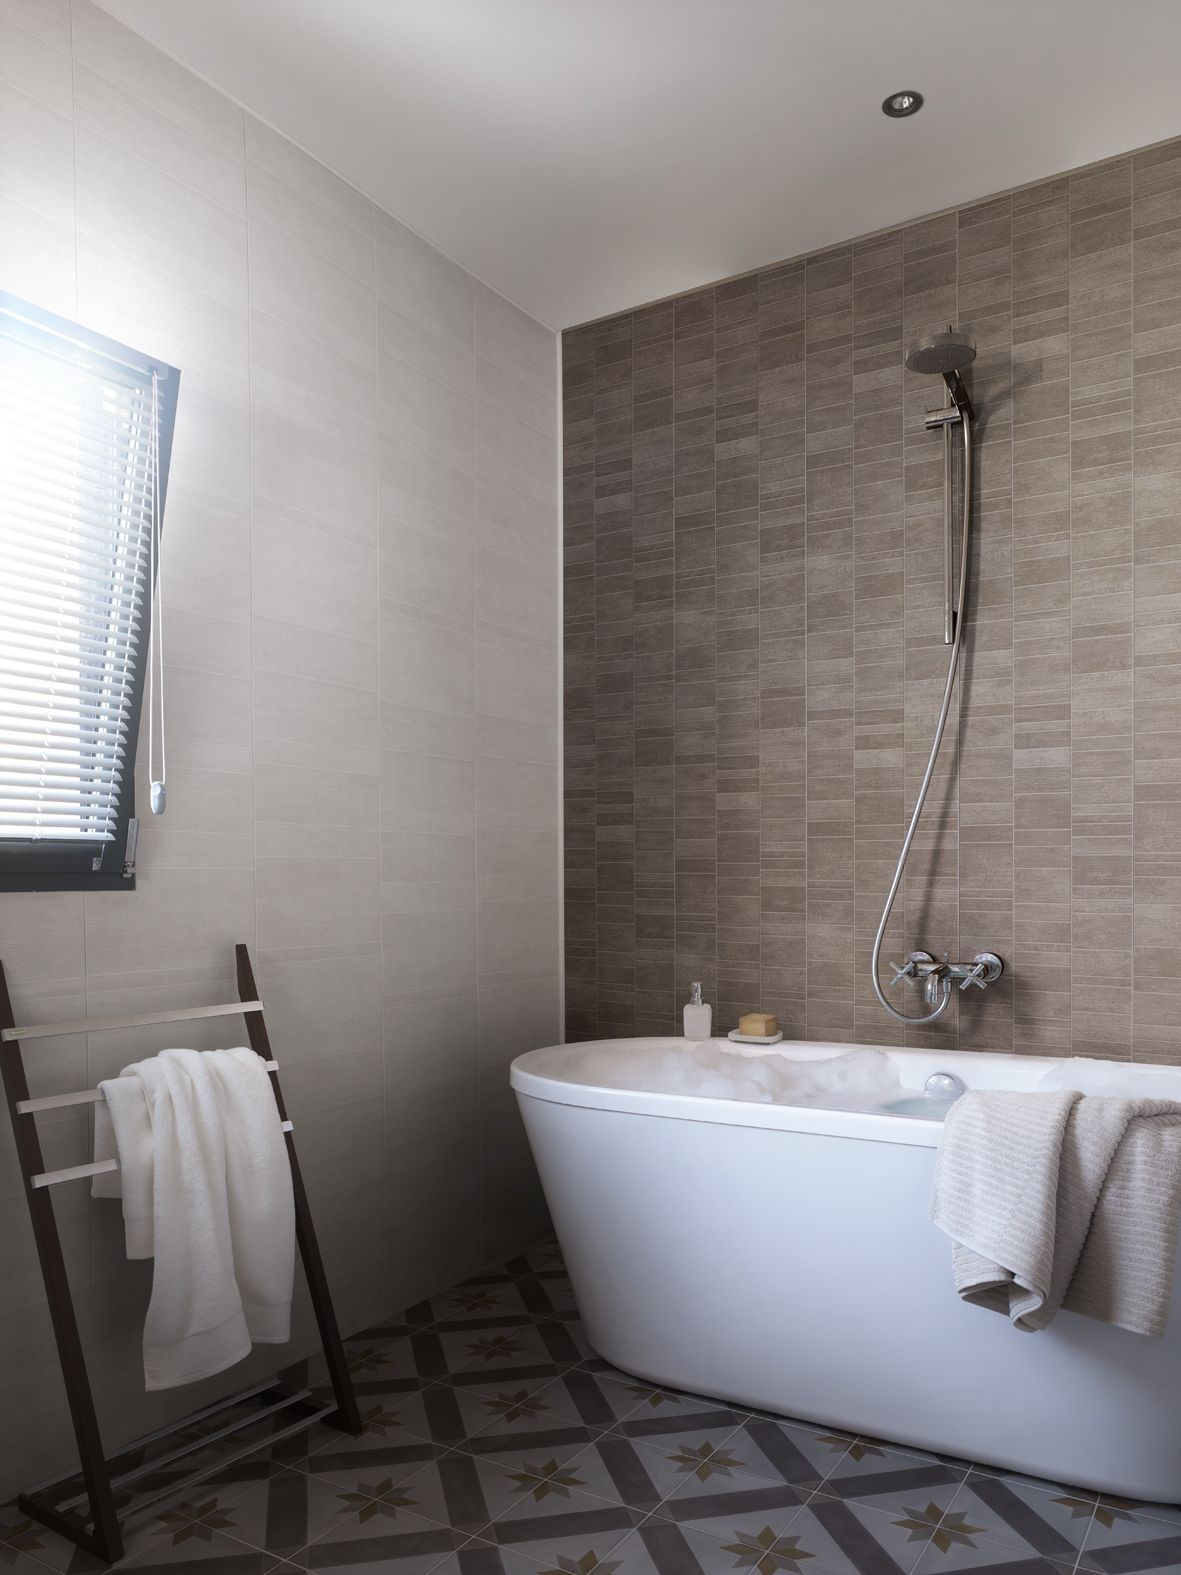 34+ Bathroom wall coverings ideas